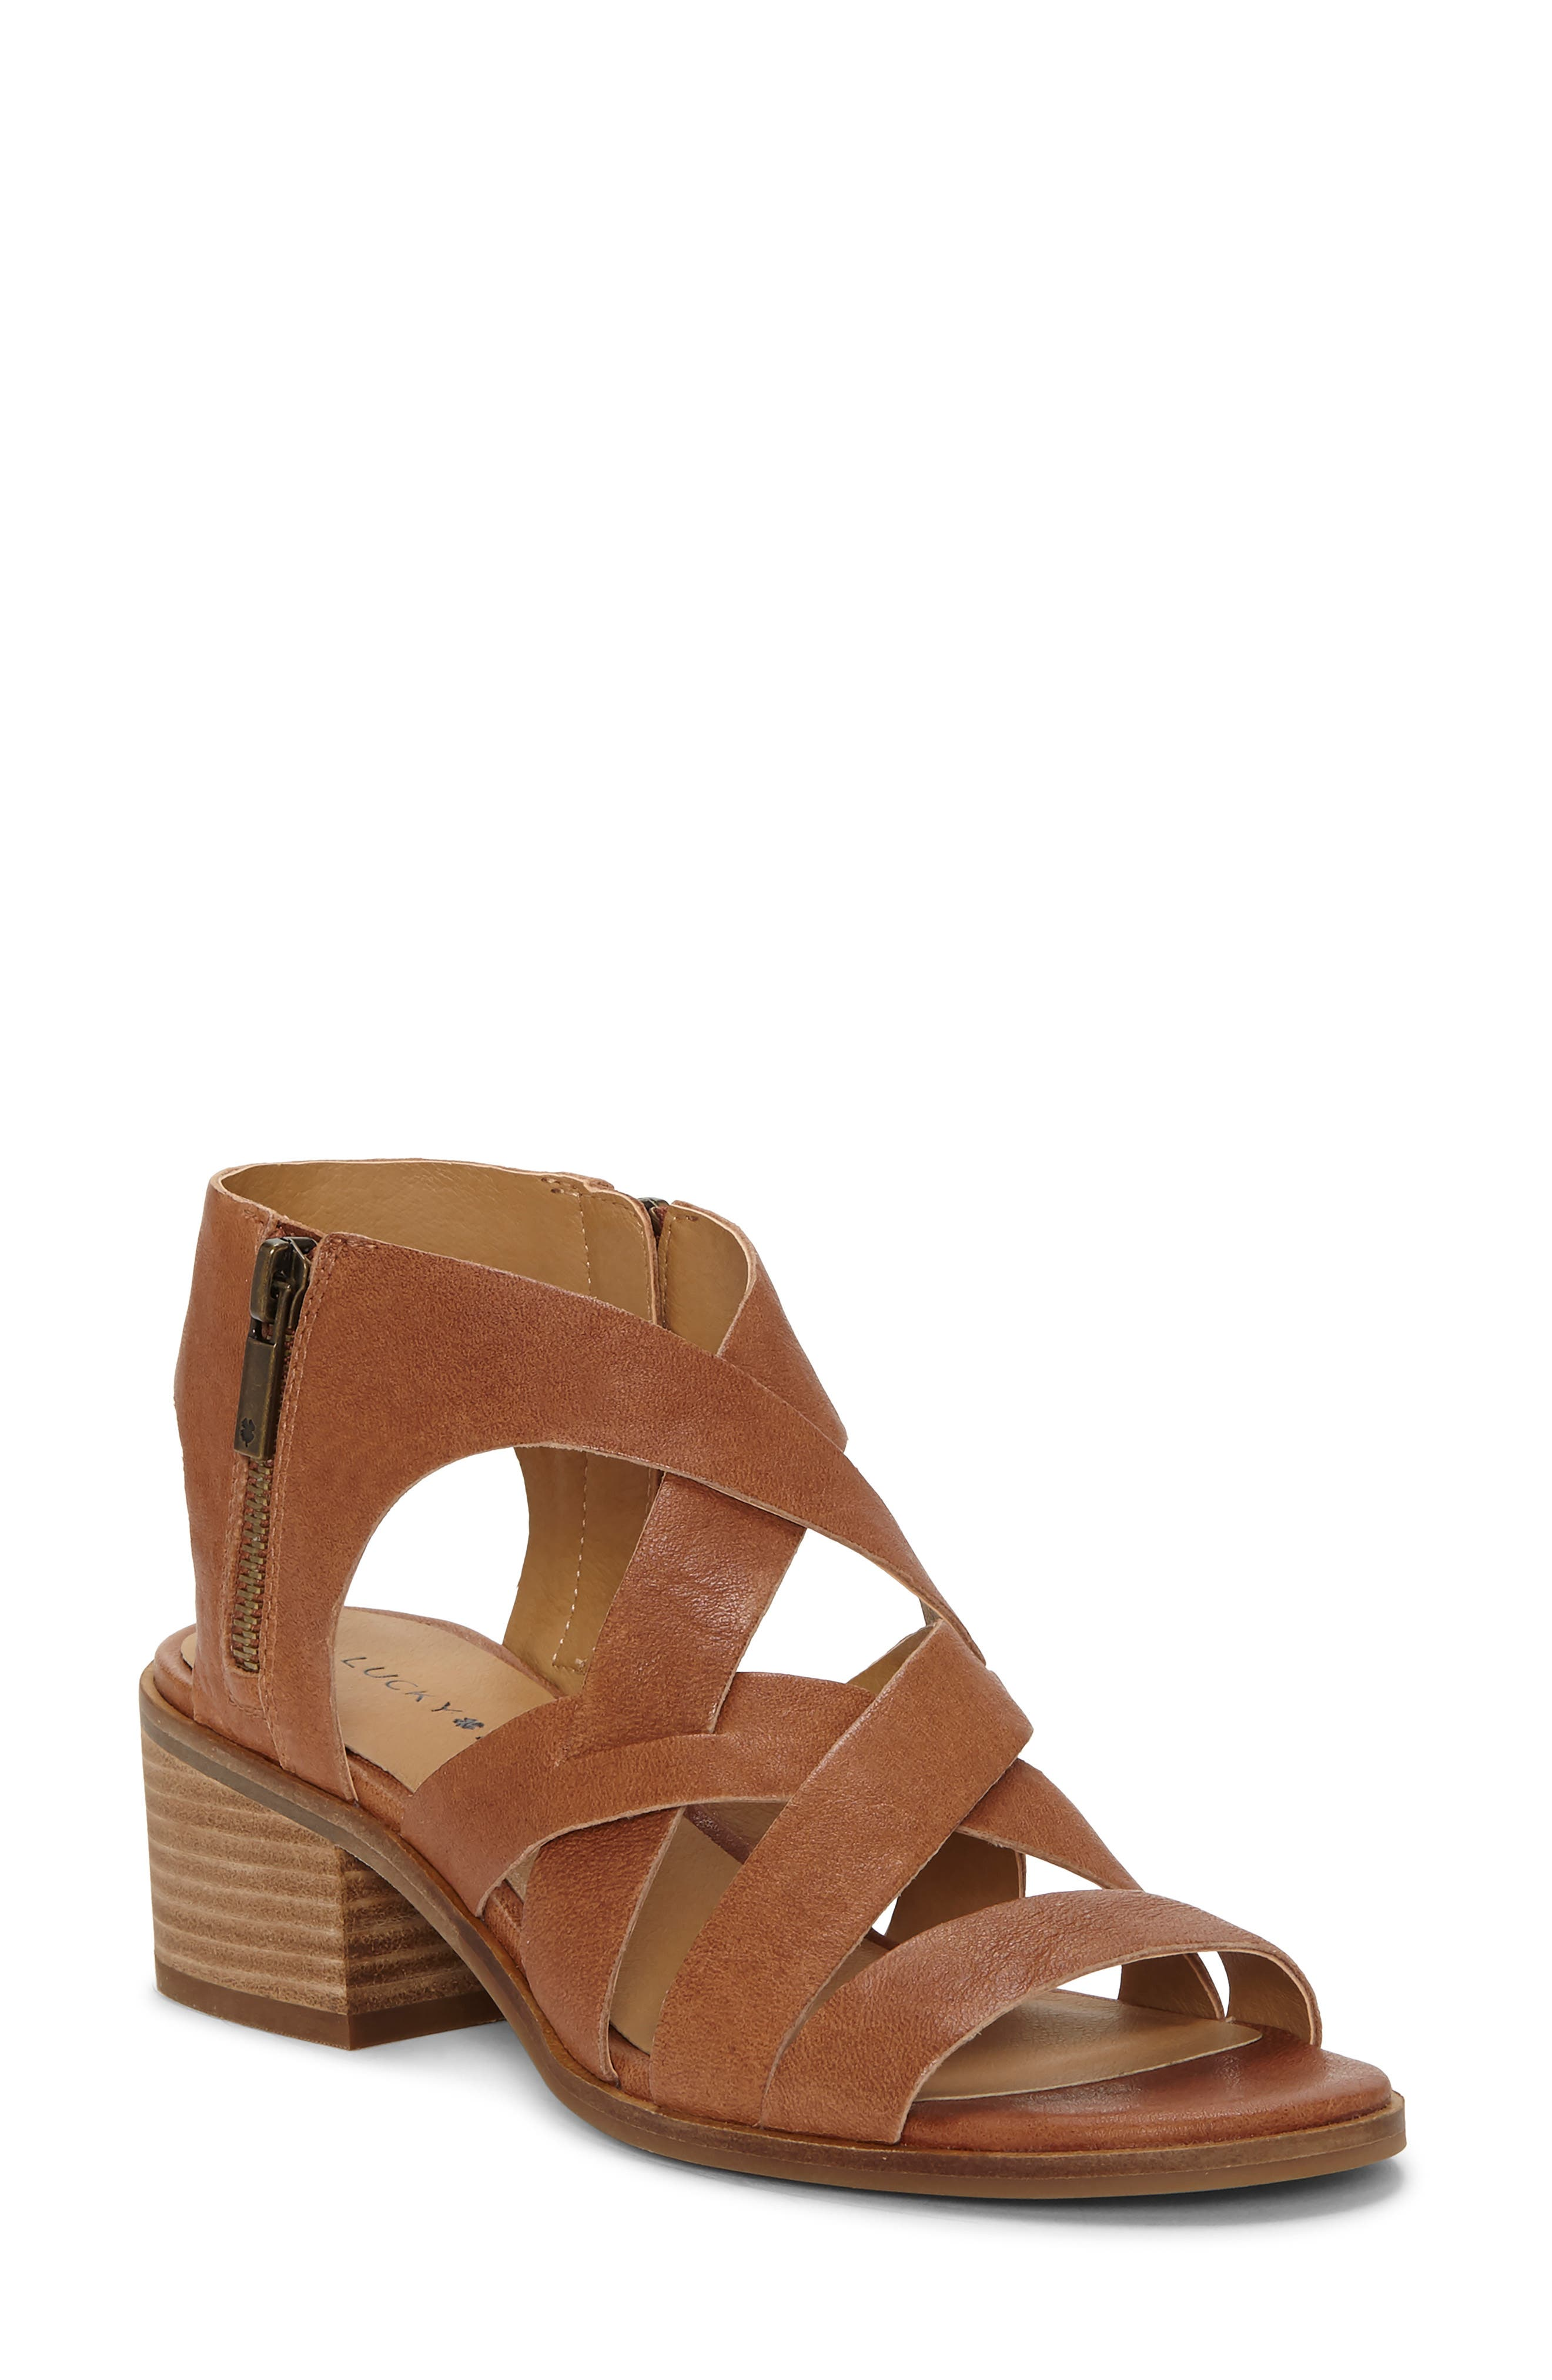 Lucky Brand Nayeli Sandal- Beige